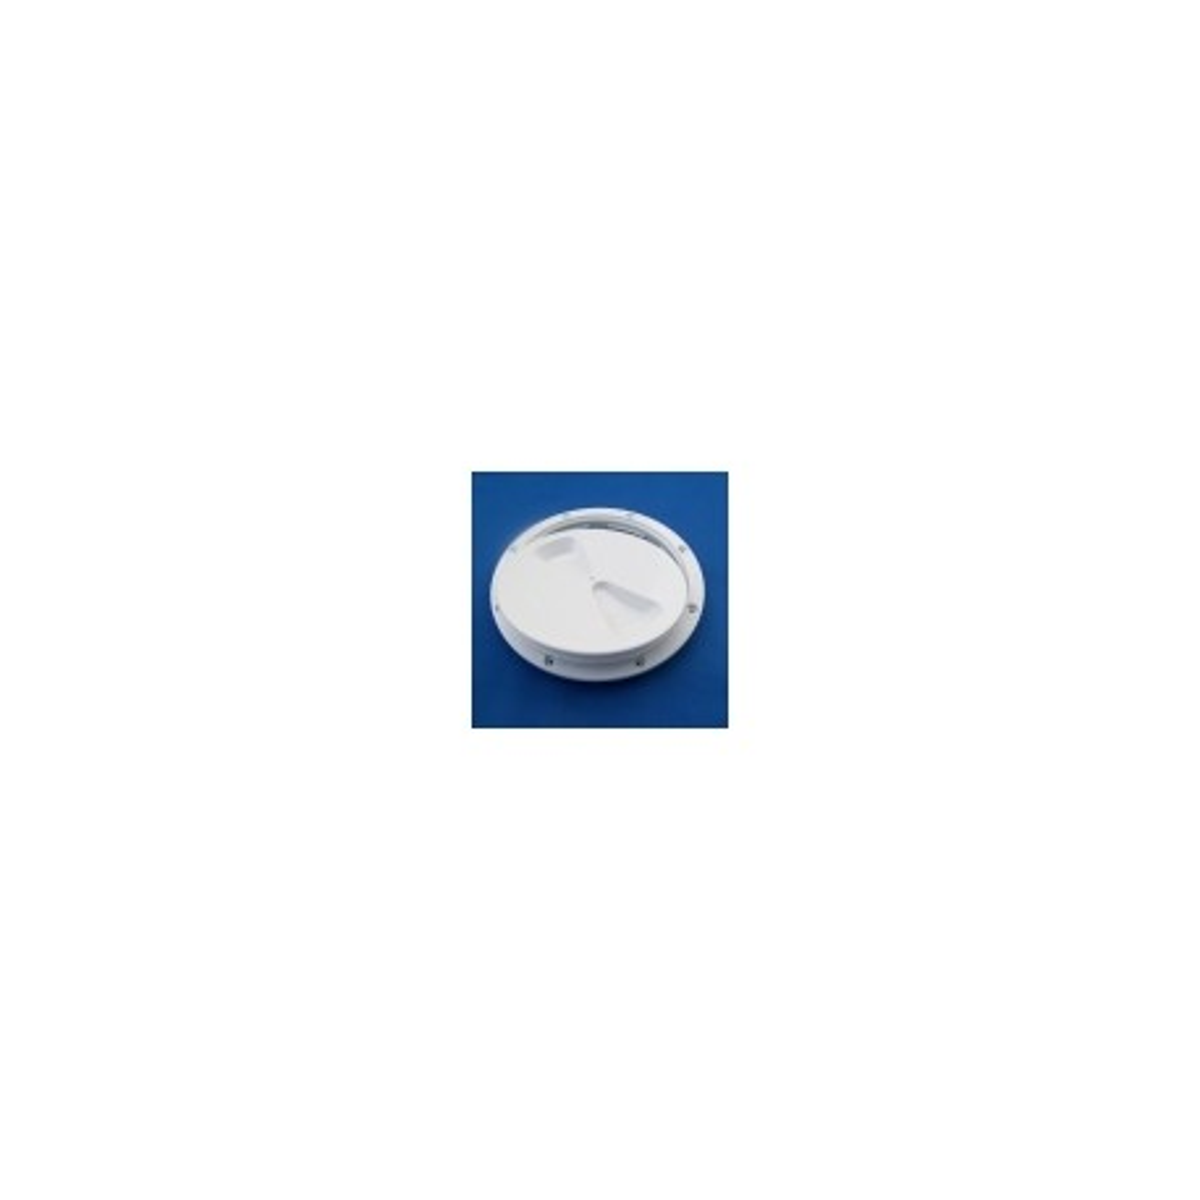 trappe de visite blanche 102mm+ joint